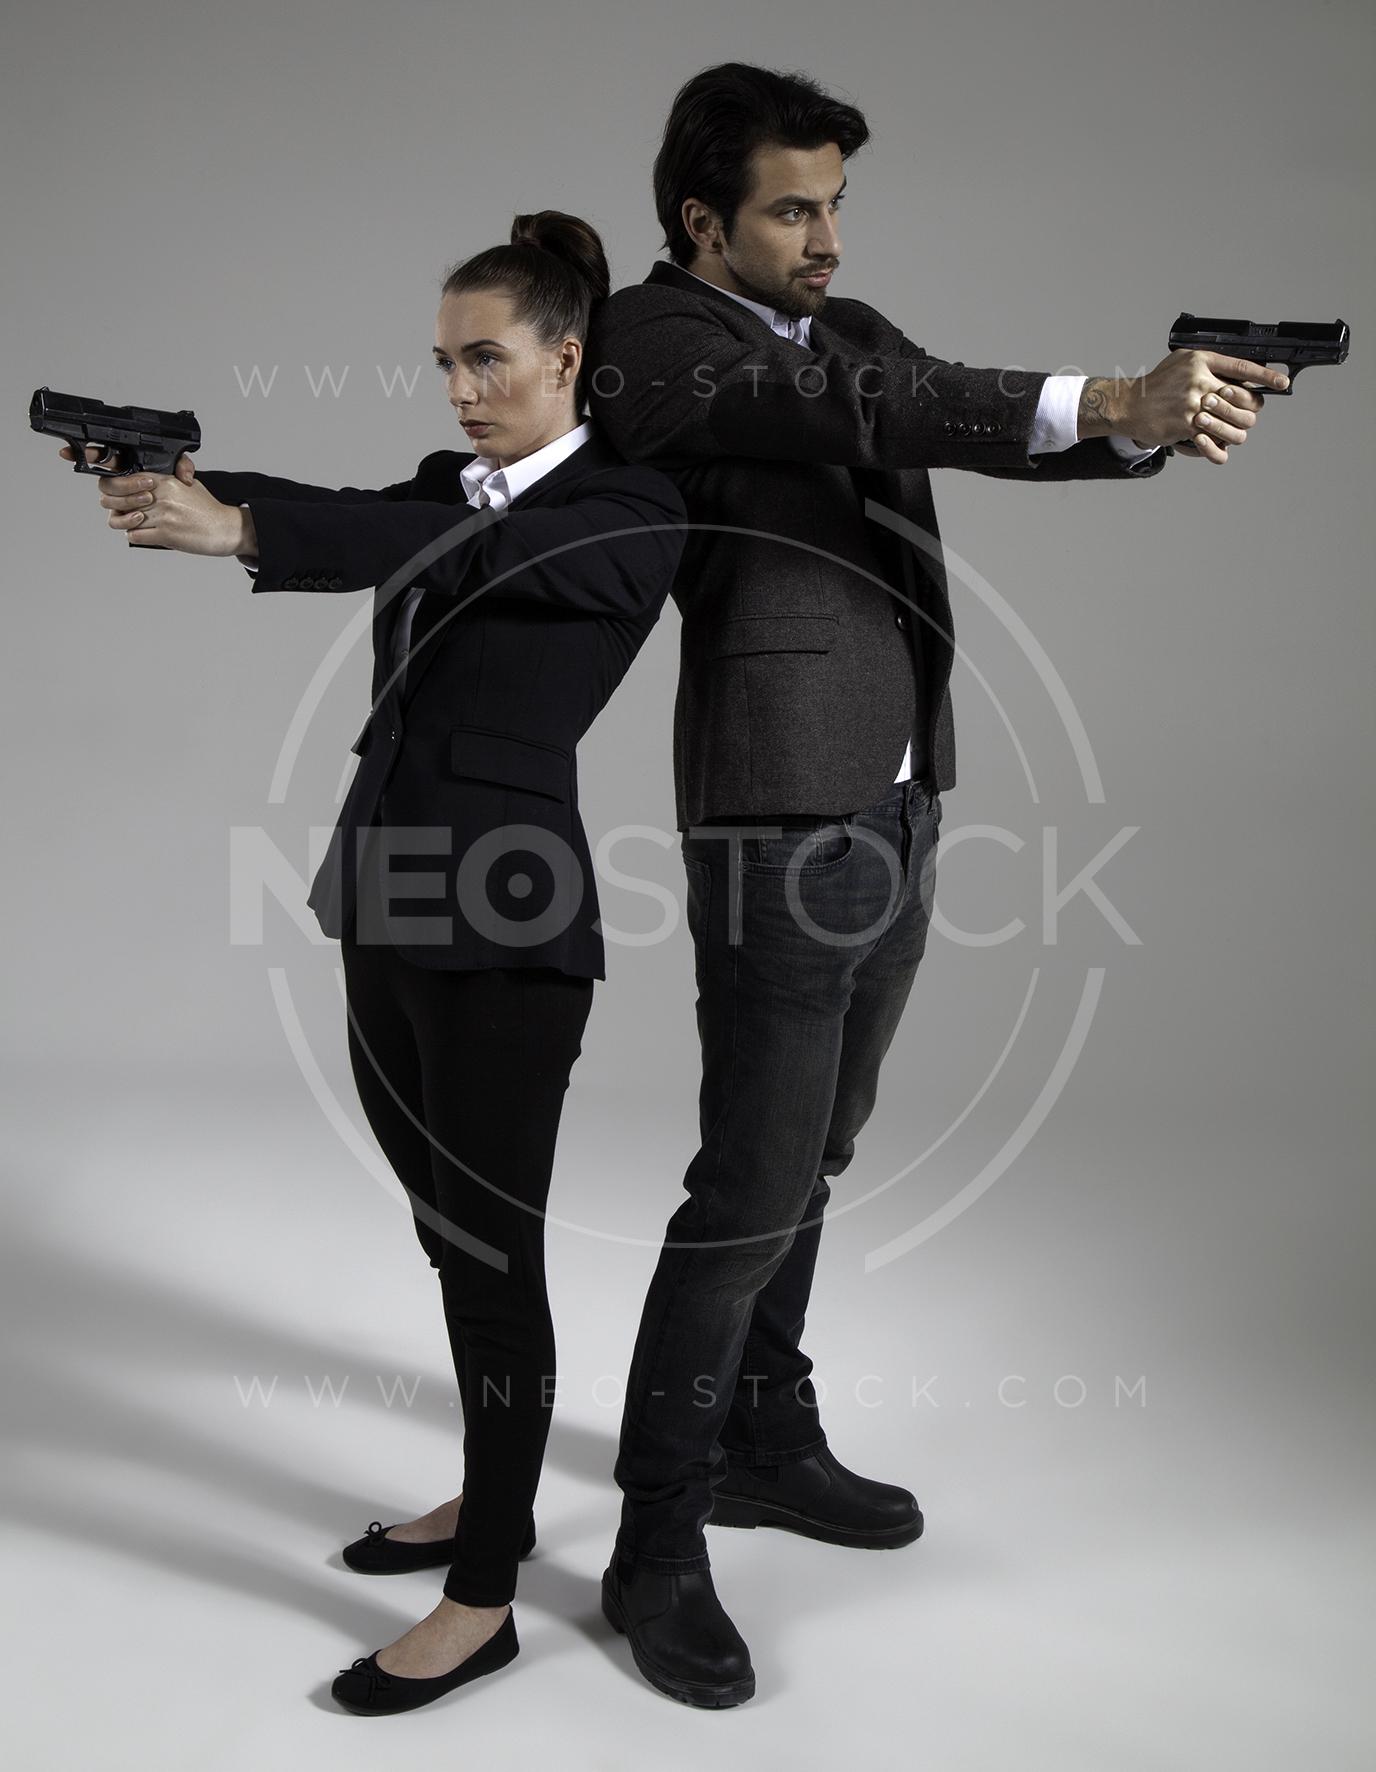 NeoStock - Cop Drama Duo - Stock Photography II